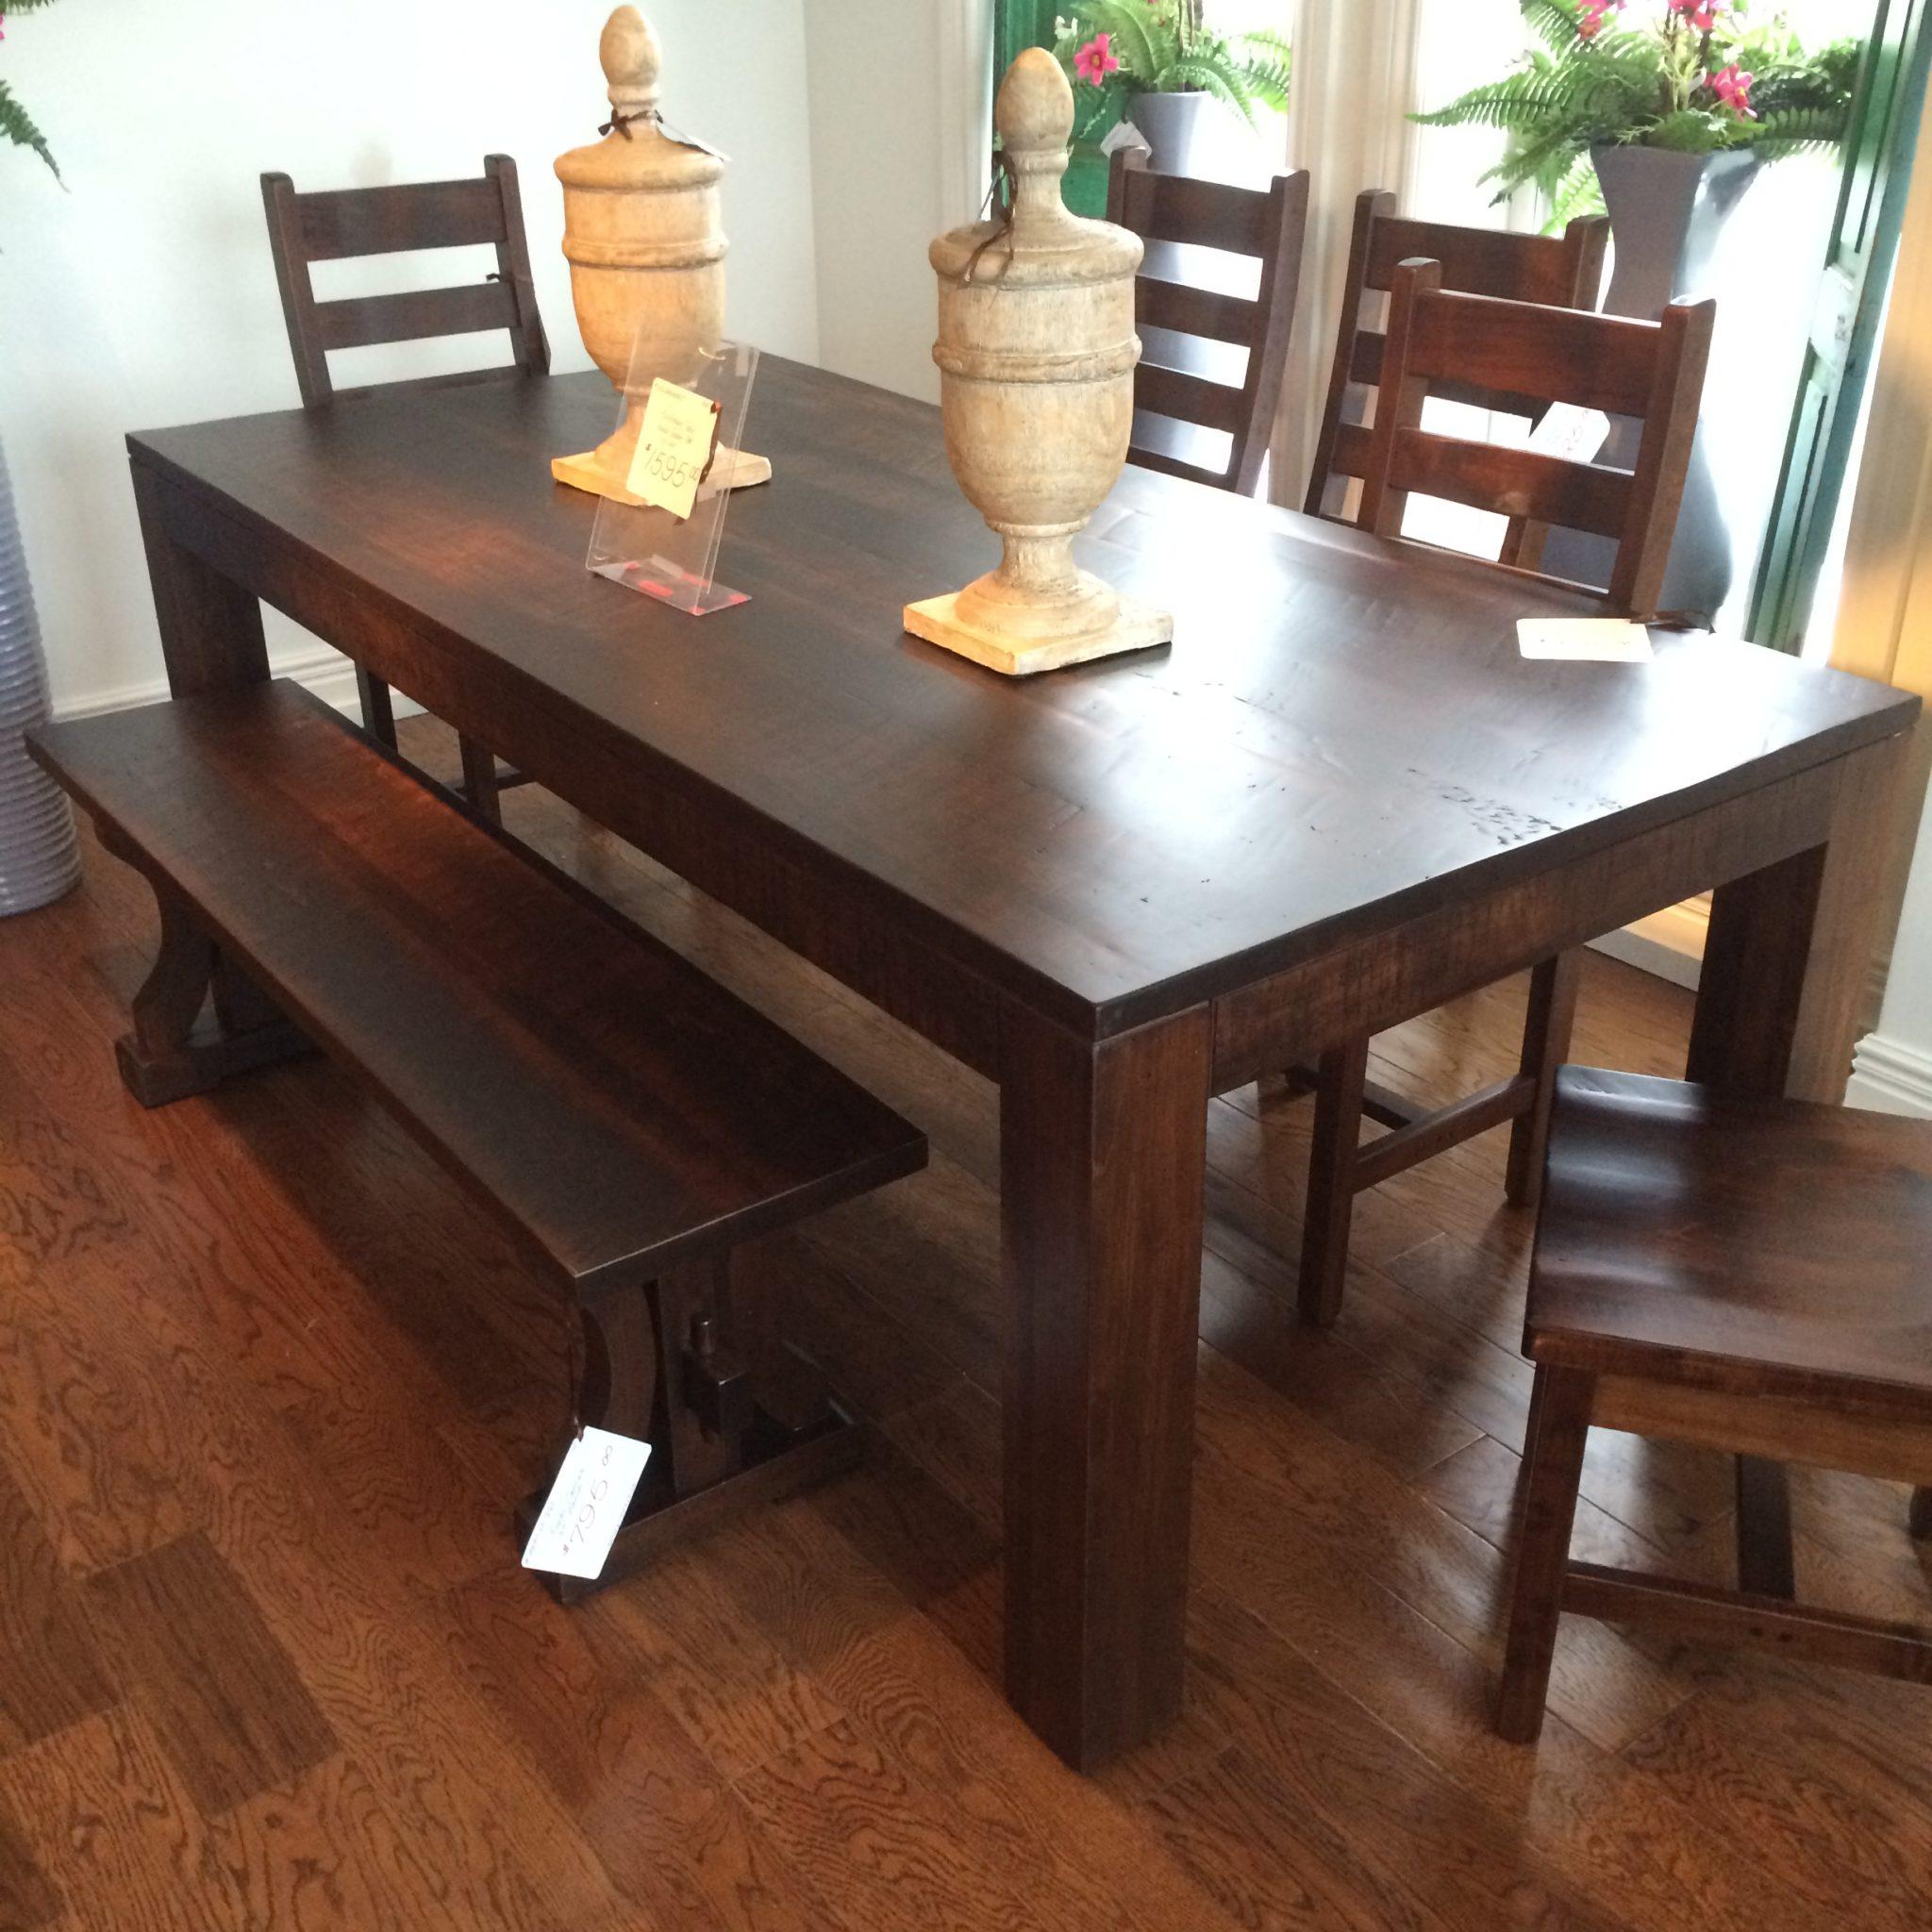 maple kitchen table honest dog food reviews heidleburg solid dining hayward s the best furniture st john newfoundland